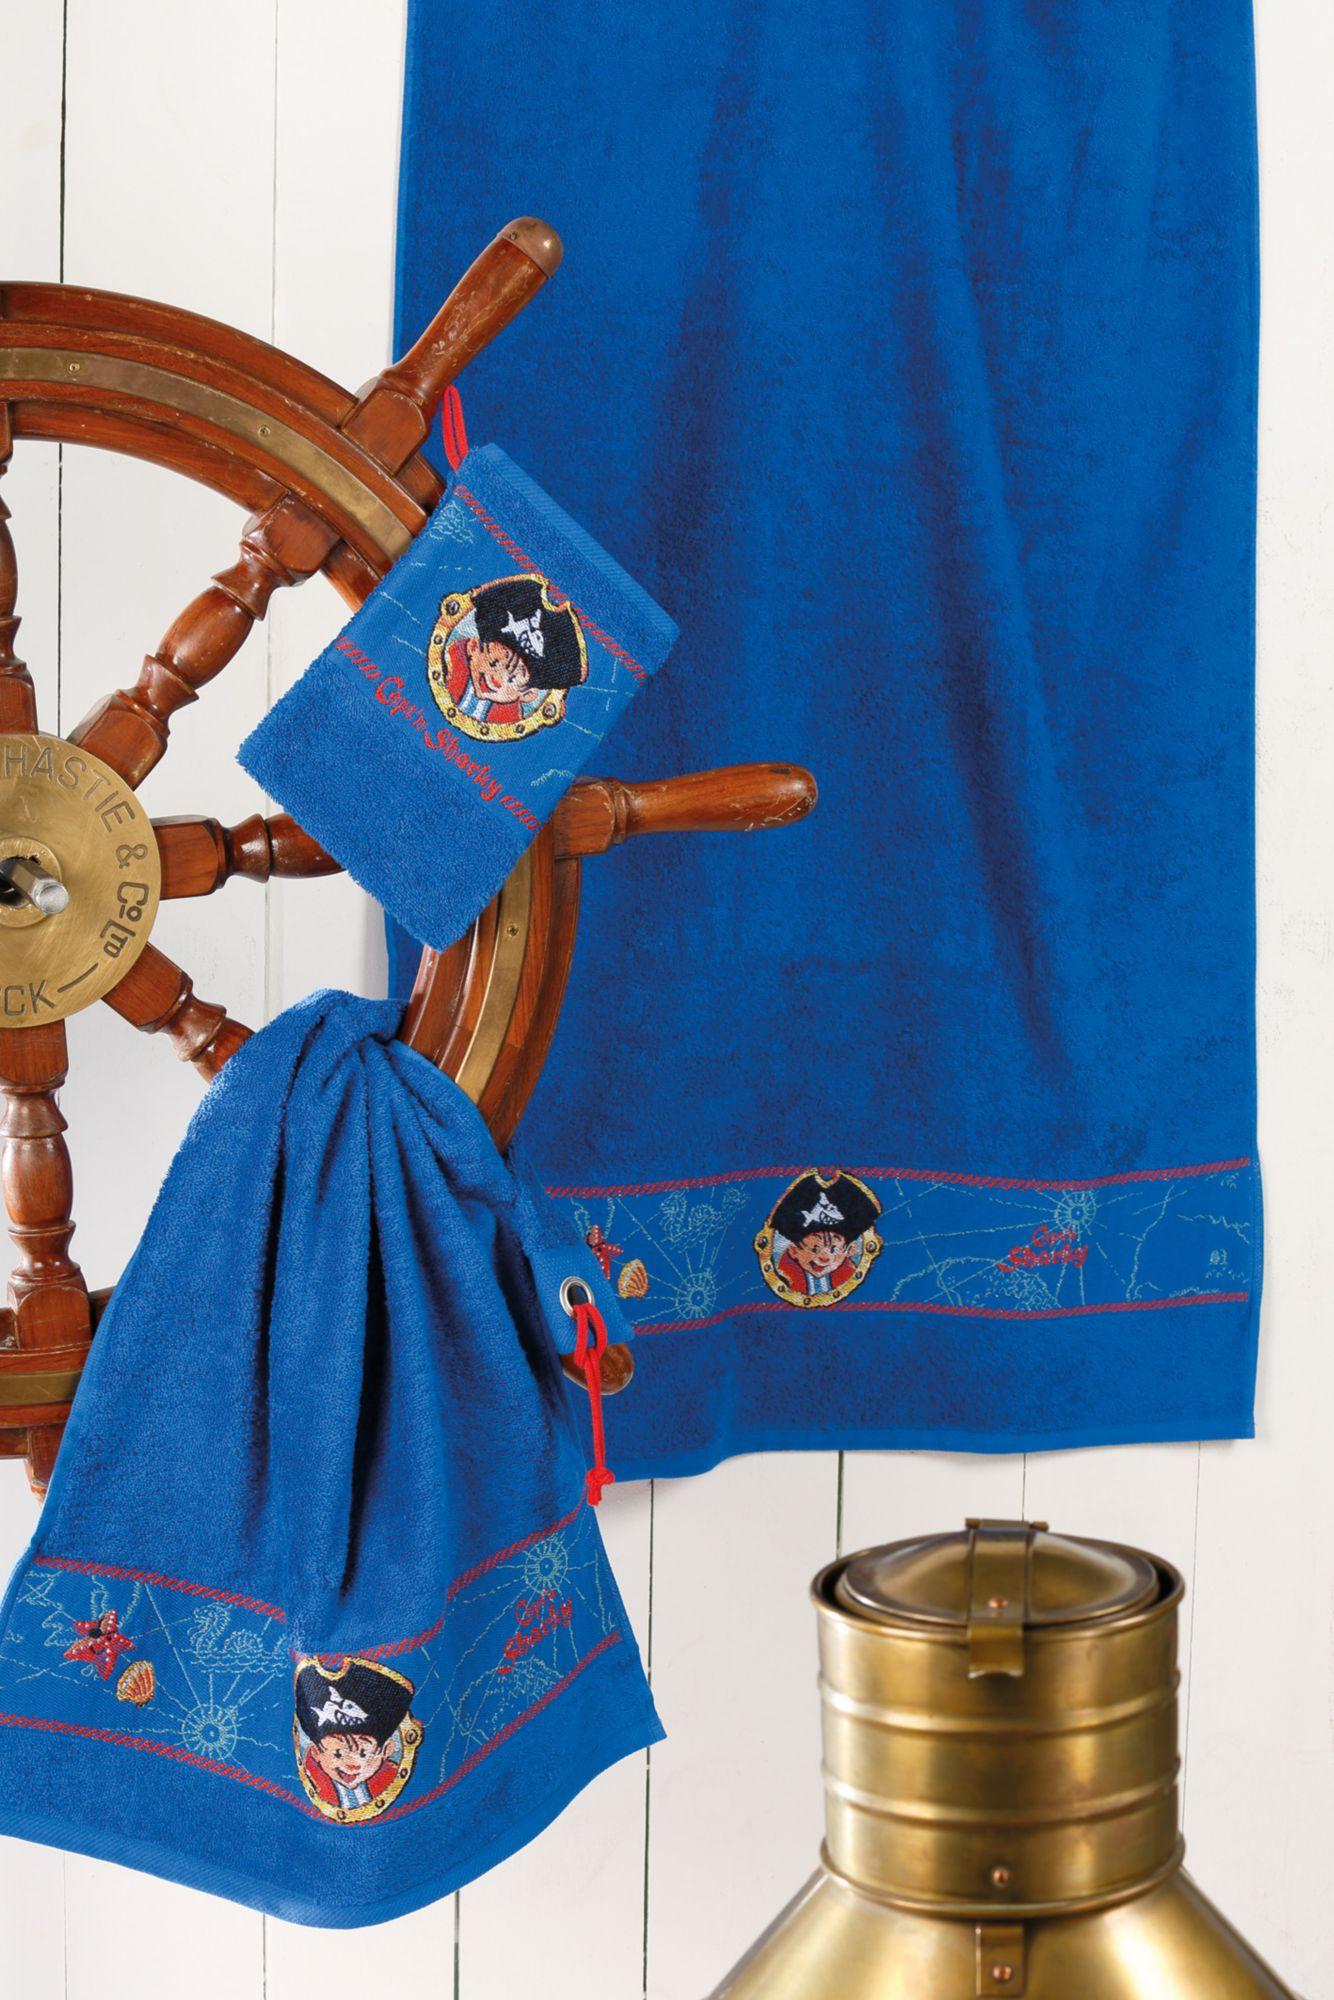 CAPTN SHARKY Handtuch Set, Capt'n Sharky, »Sharky«, mit Piraten Bordüre